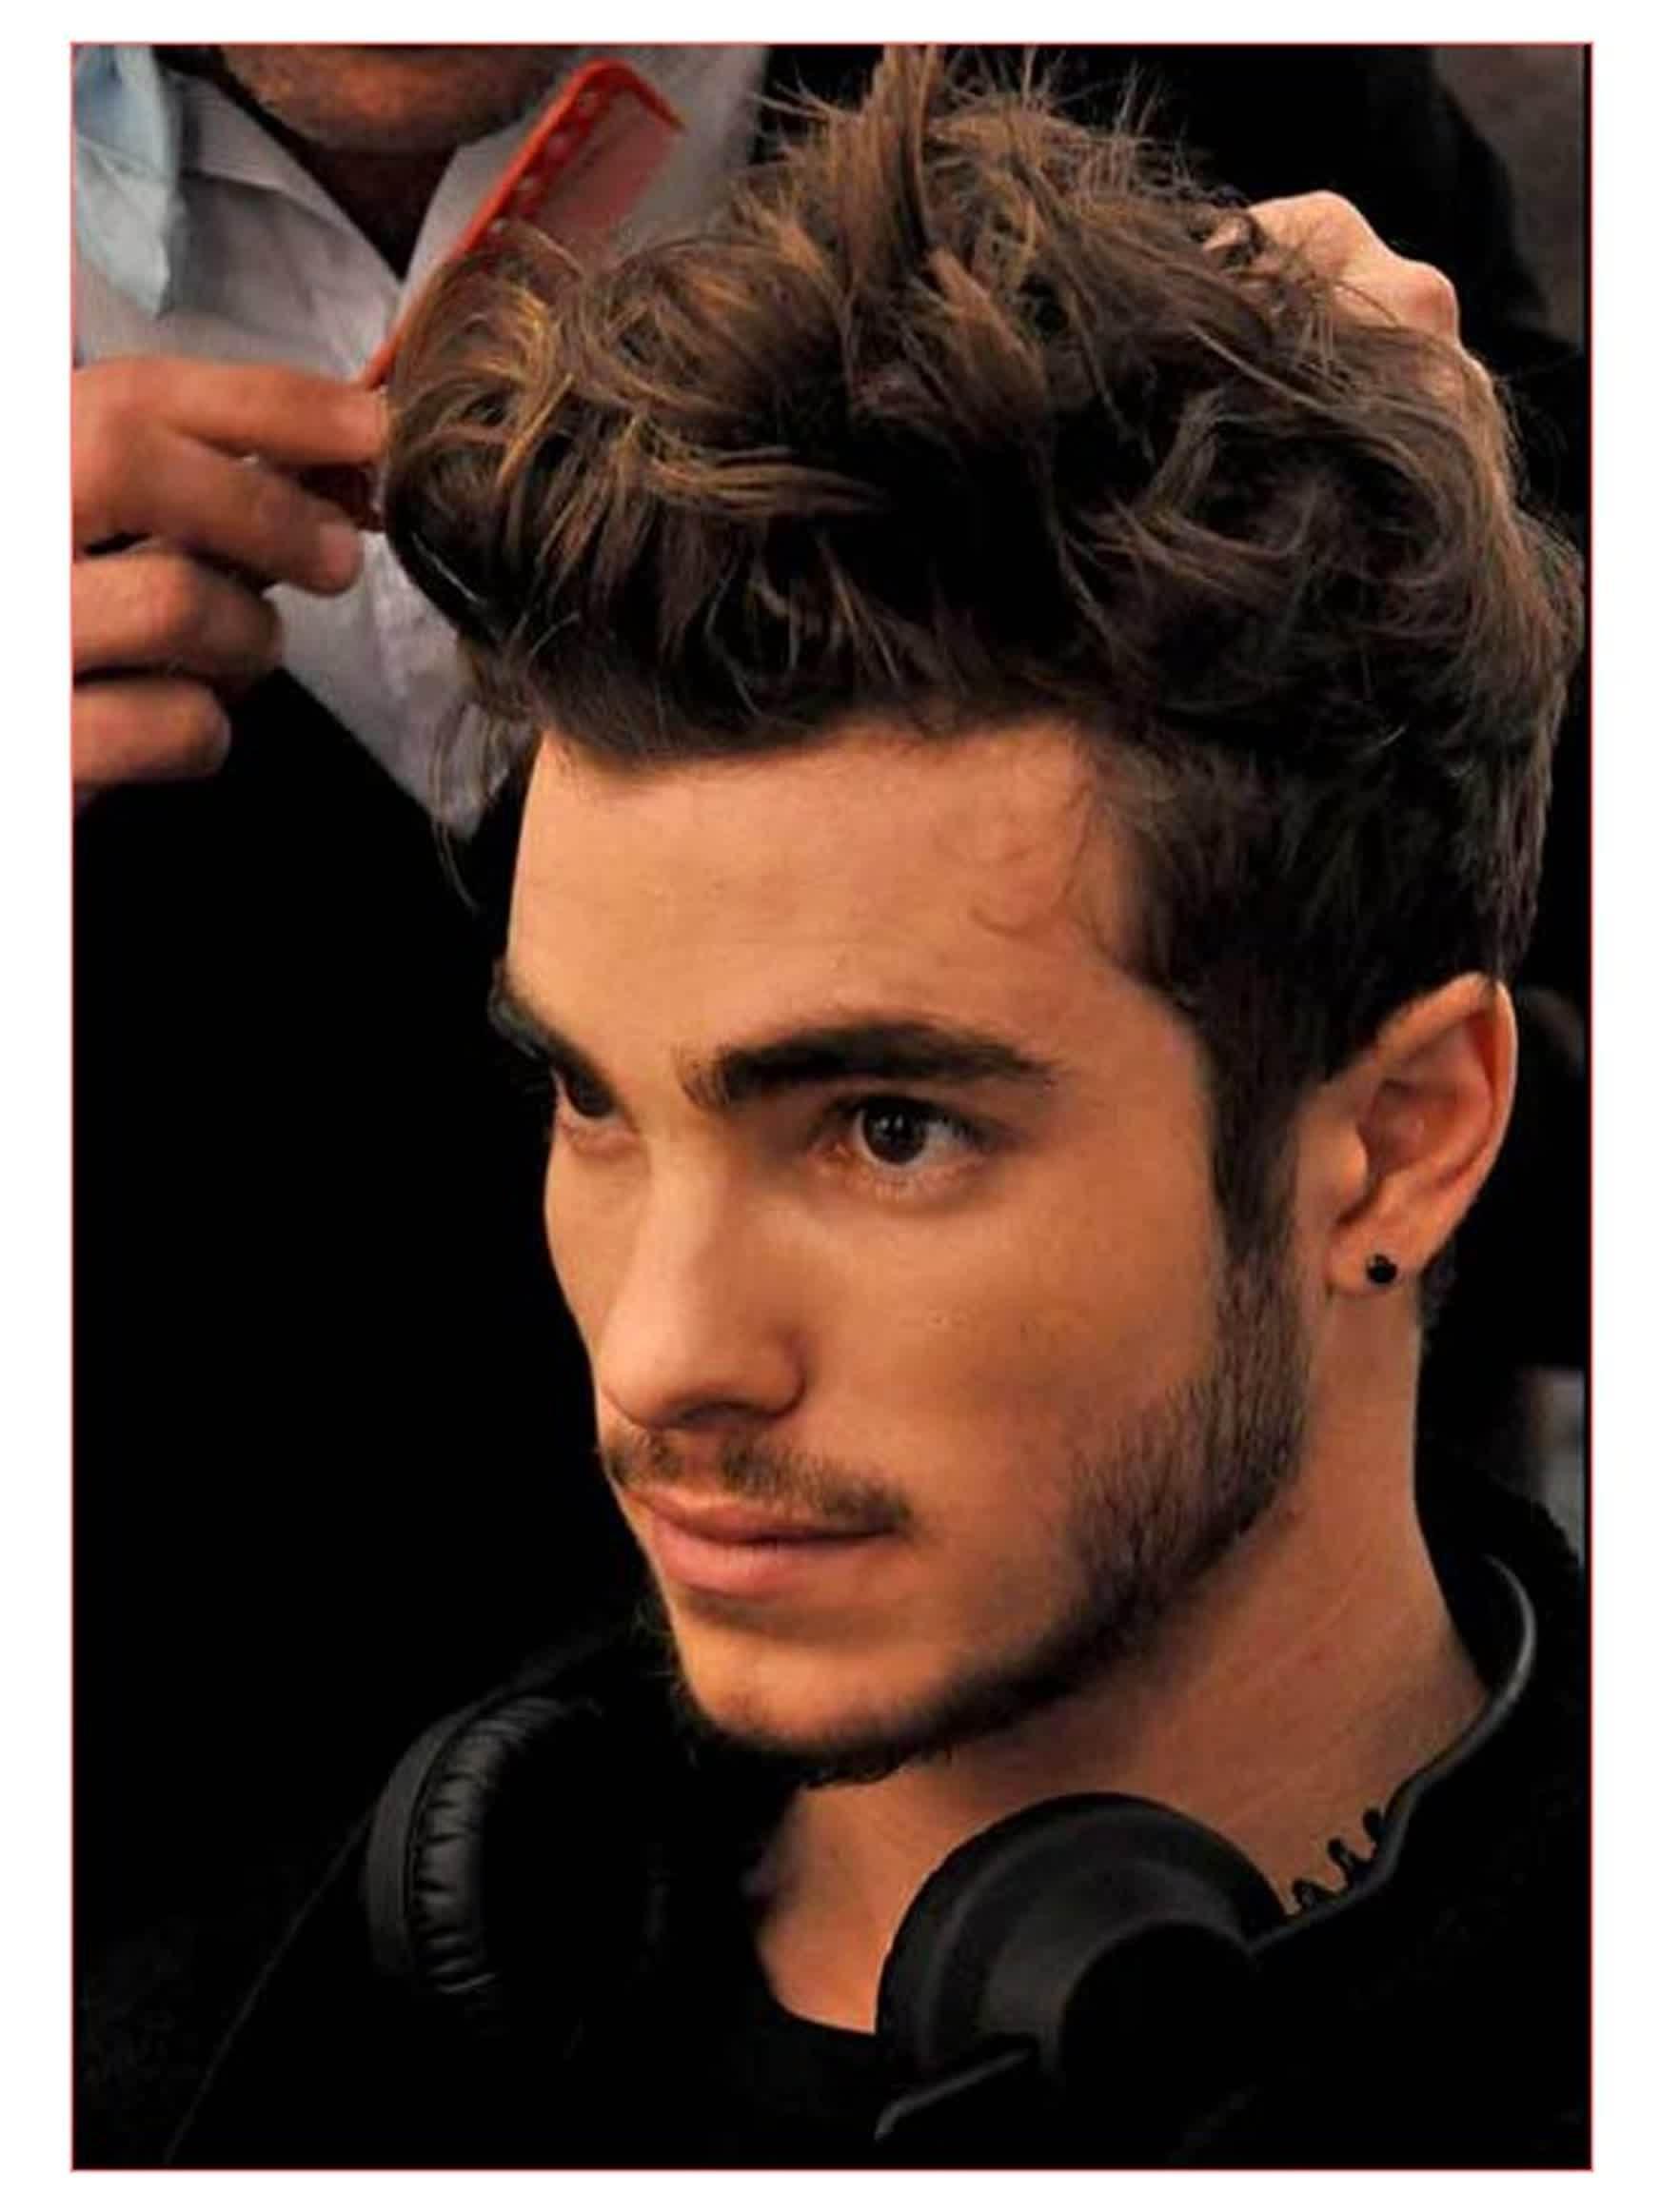 Frisuren Namen Der Neuen Manner Haarschnitt Manner Herrenhaarschnitt Frisuren